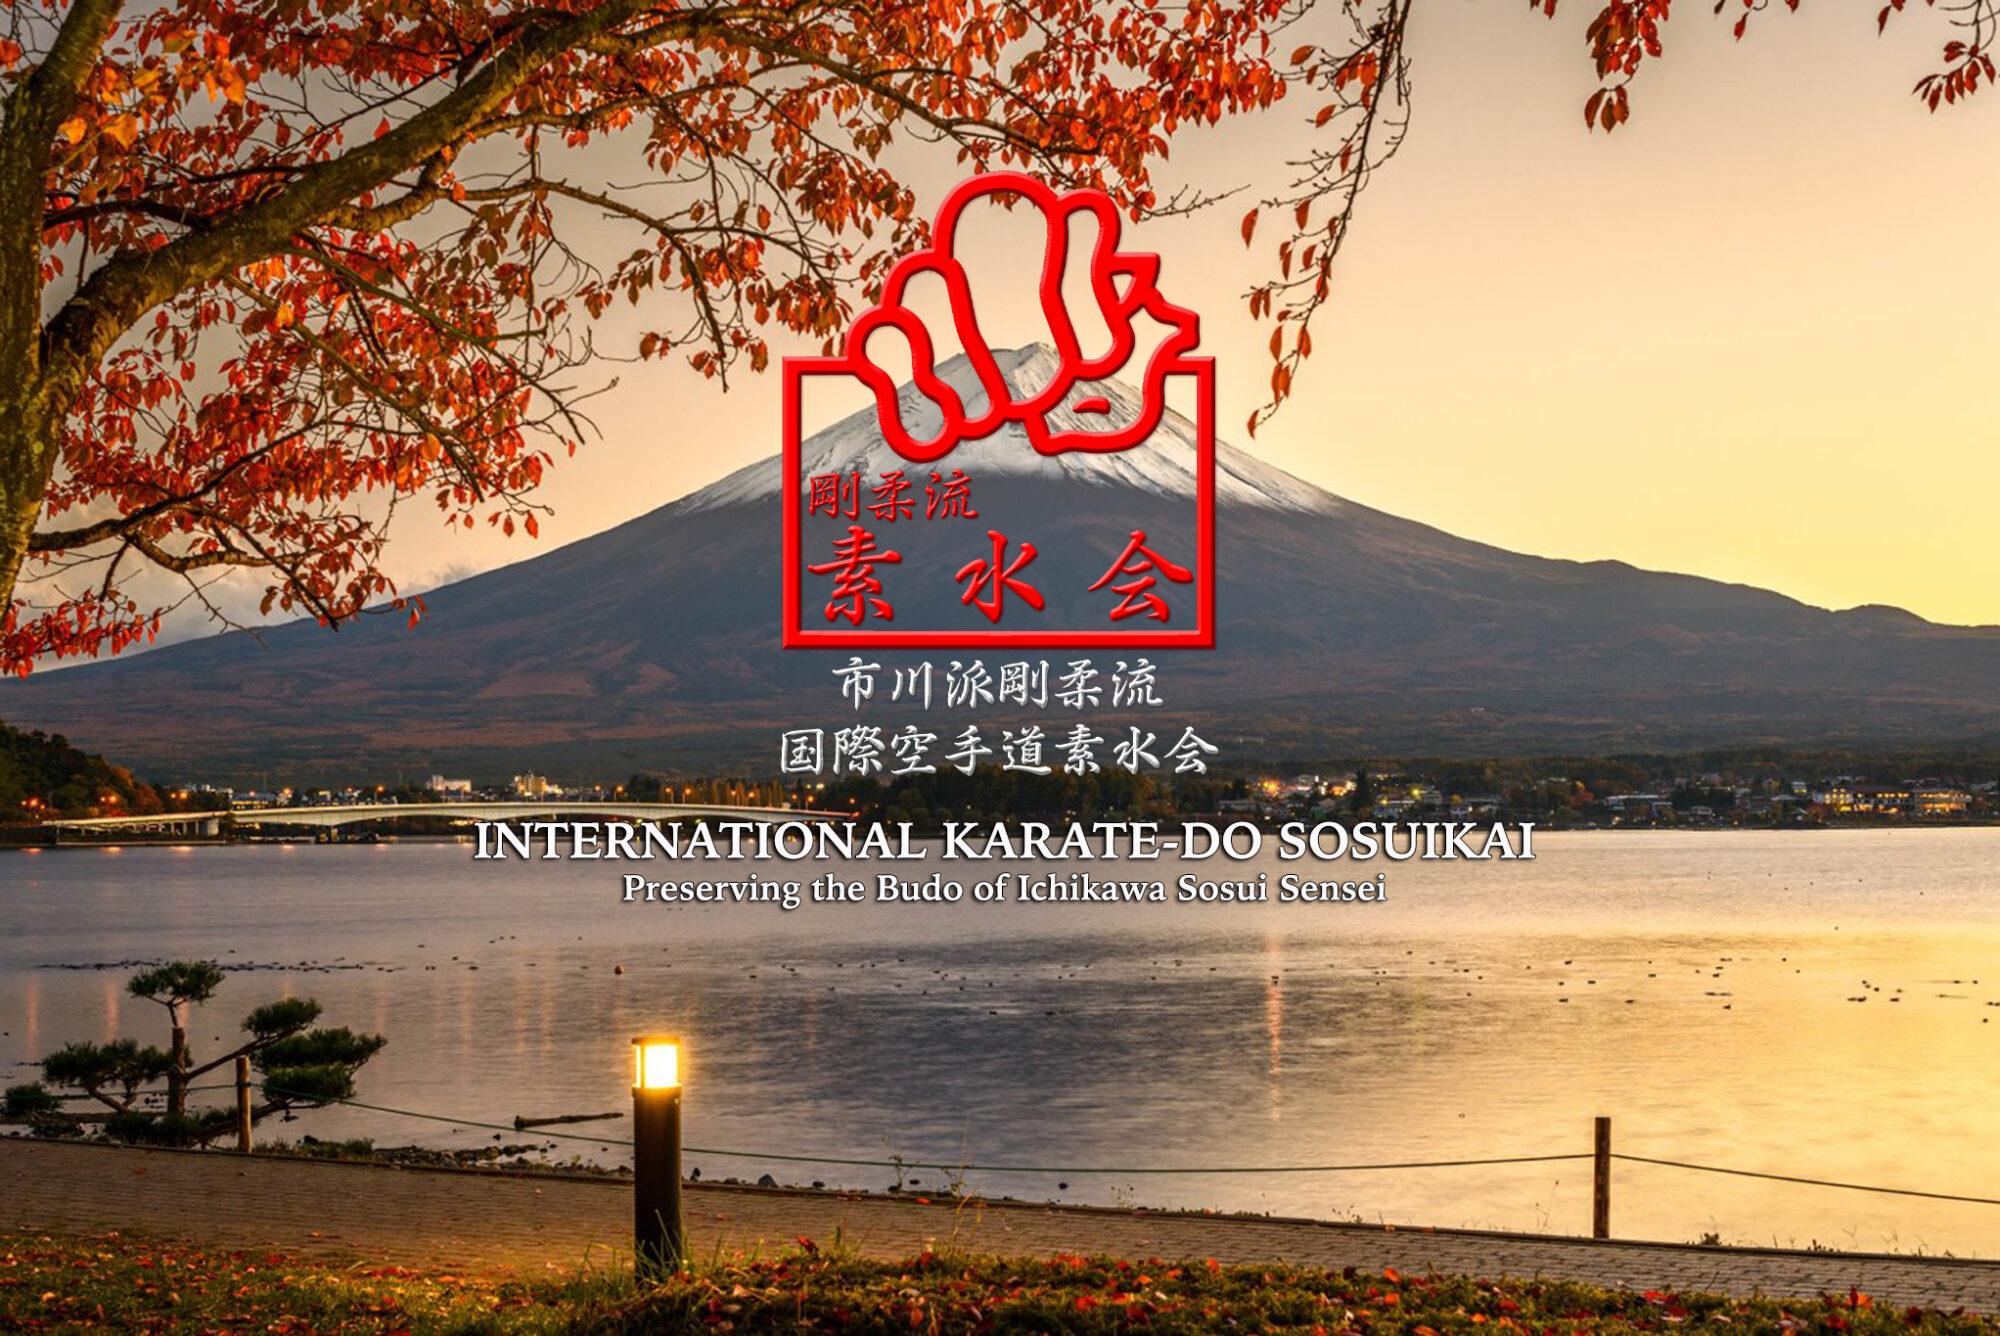 International Karate-do Sosuikai